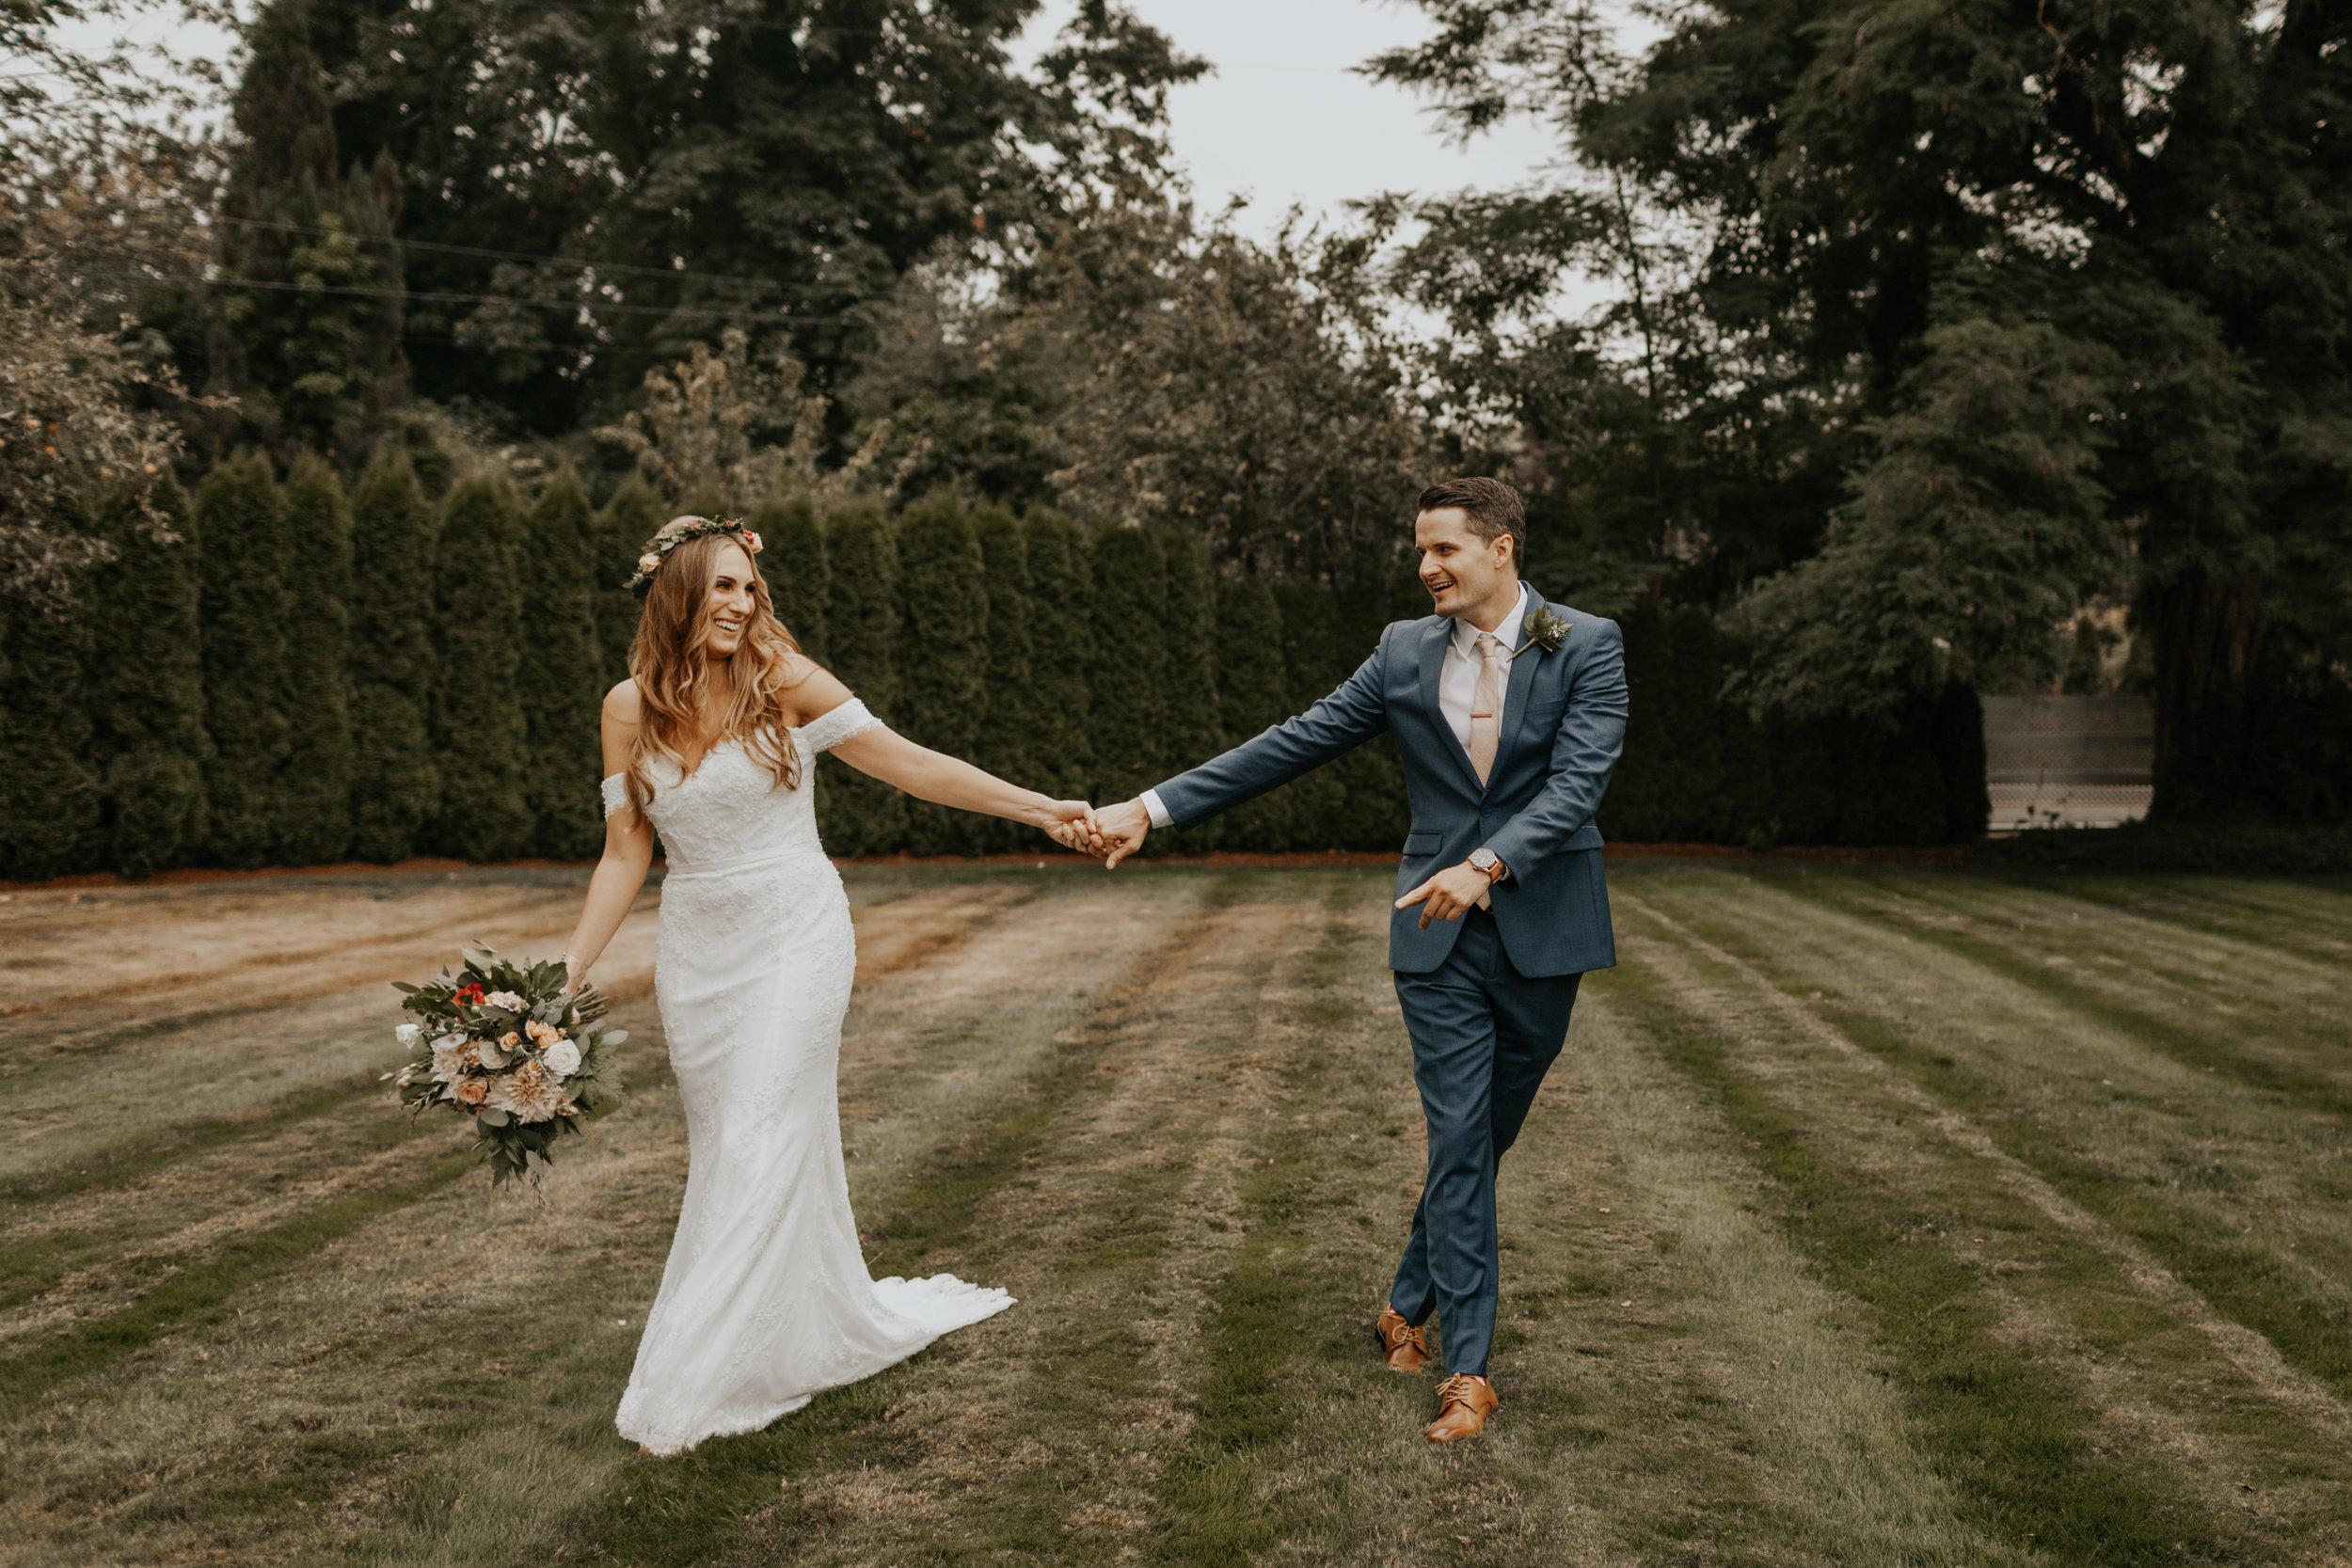 ginapaulson_jakitrevor_wedding-153.jpg